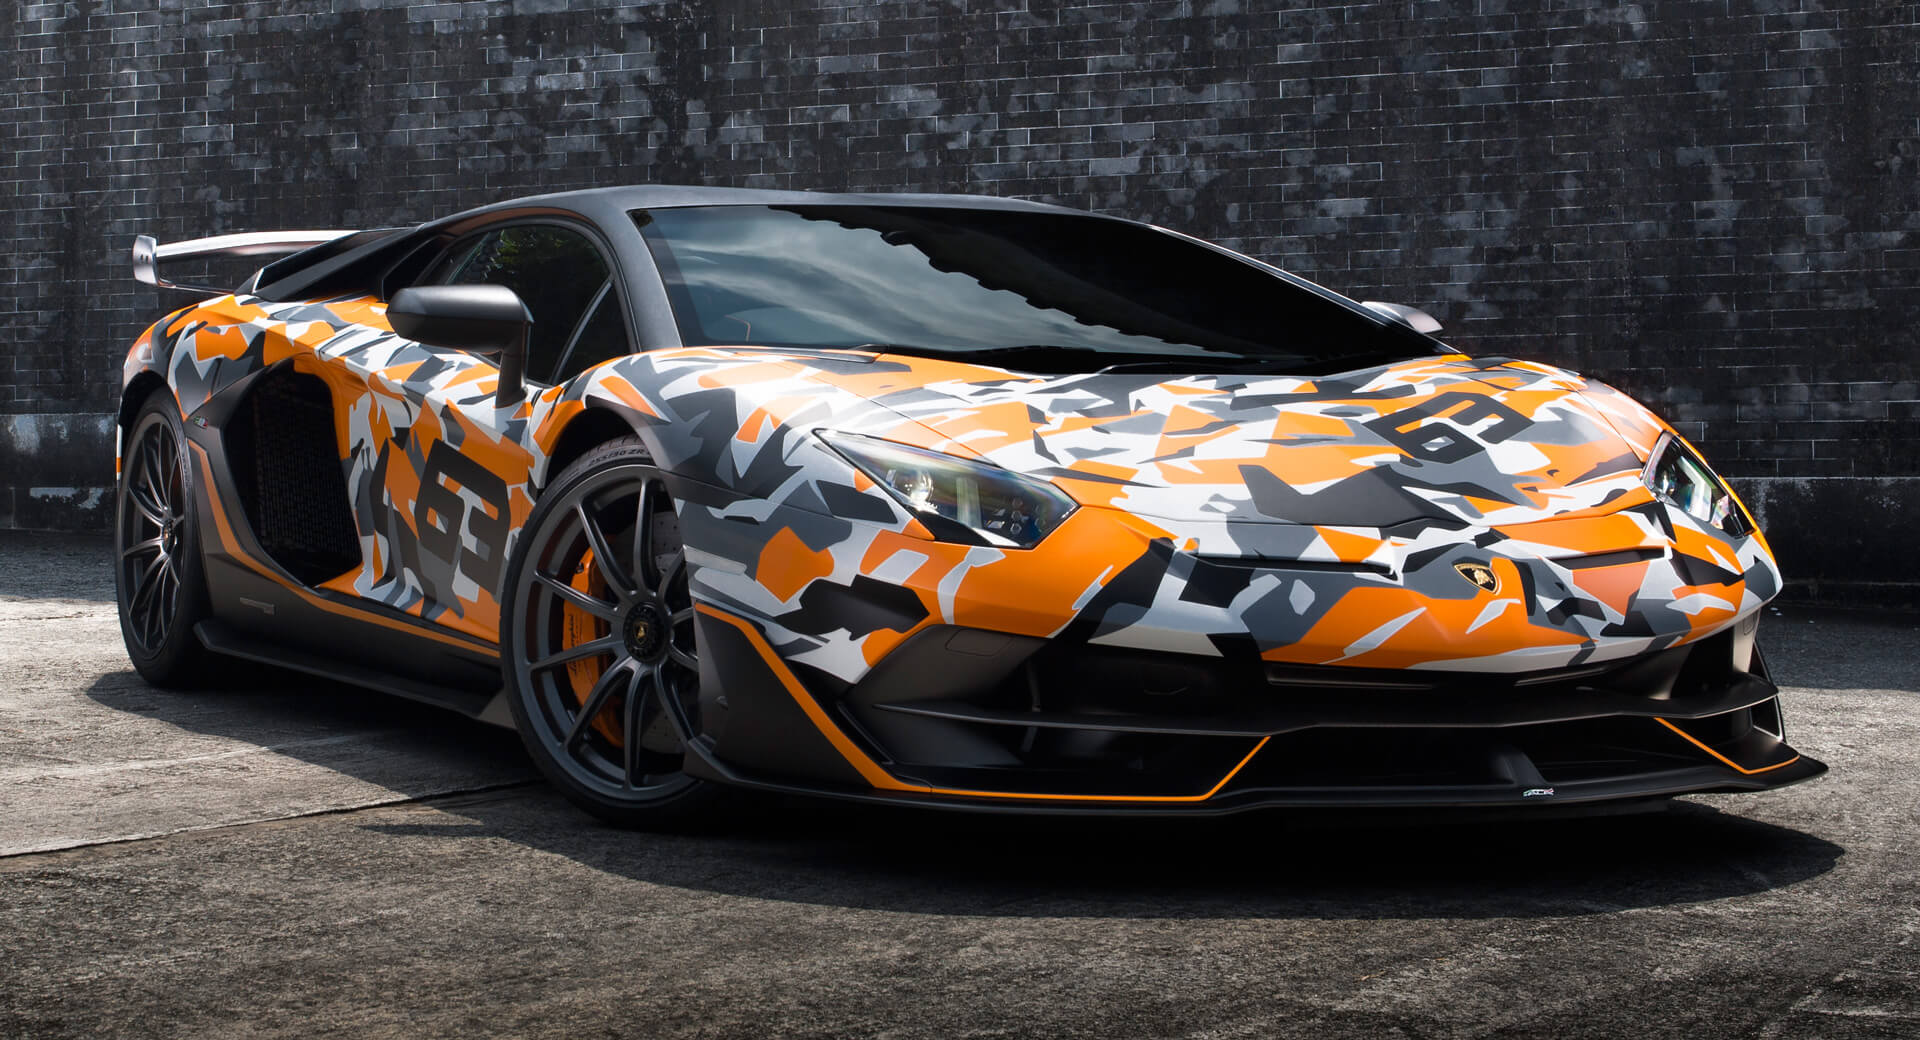 Bespoke Lamborghini Aventador Svj 63 Pays Tribute To The Ring Record Breaker Carscoops